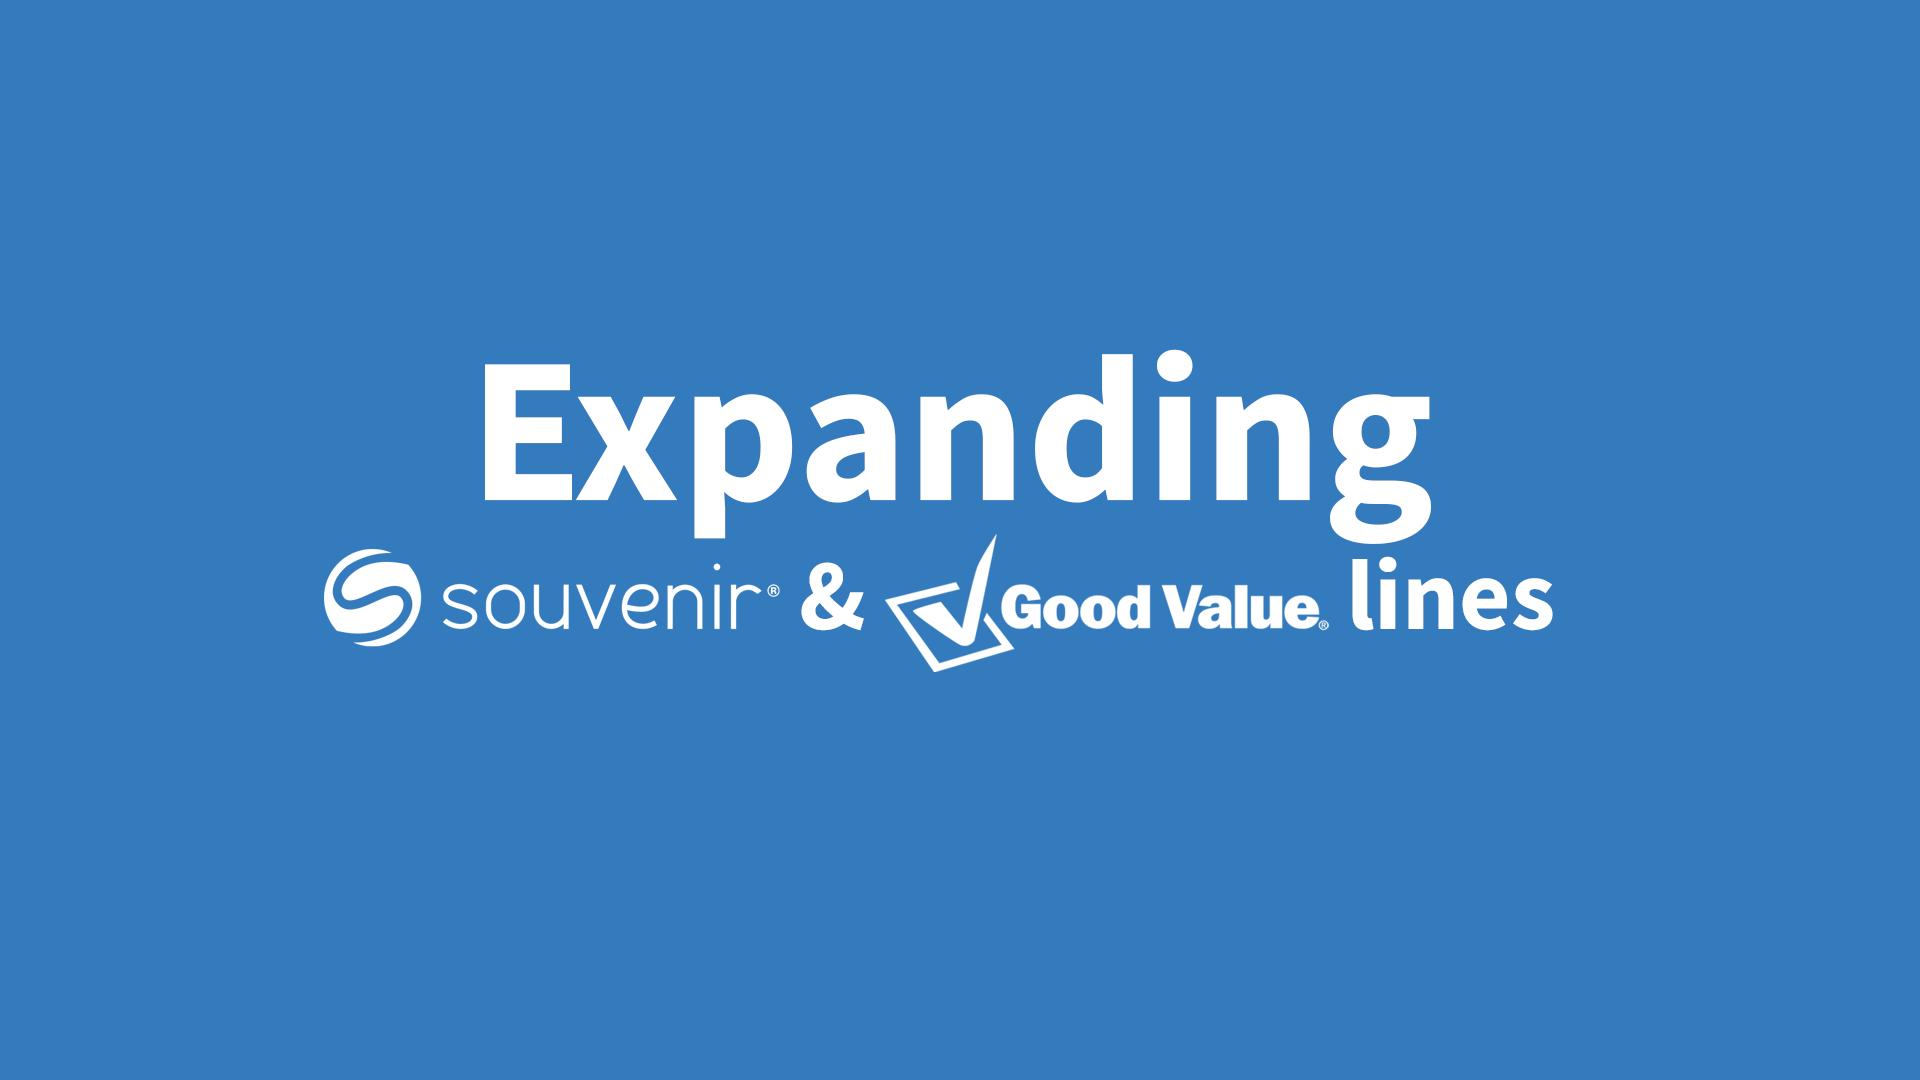 Expanding Souvenir and Good Value lines